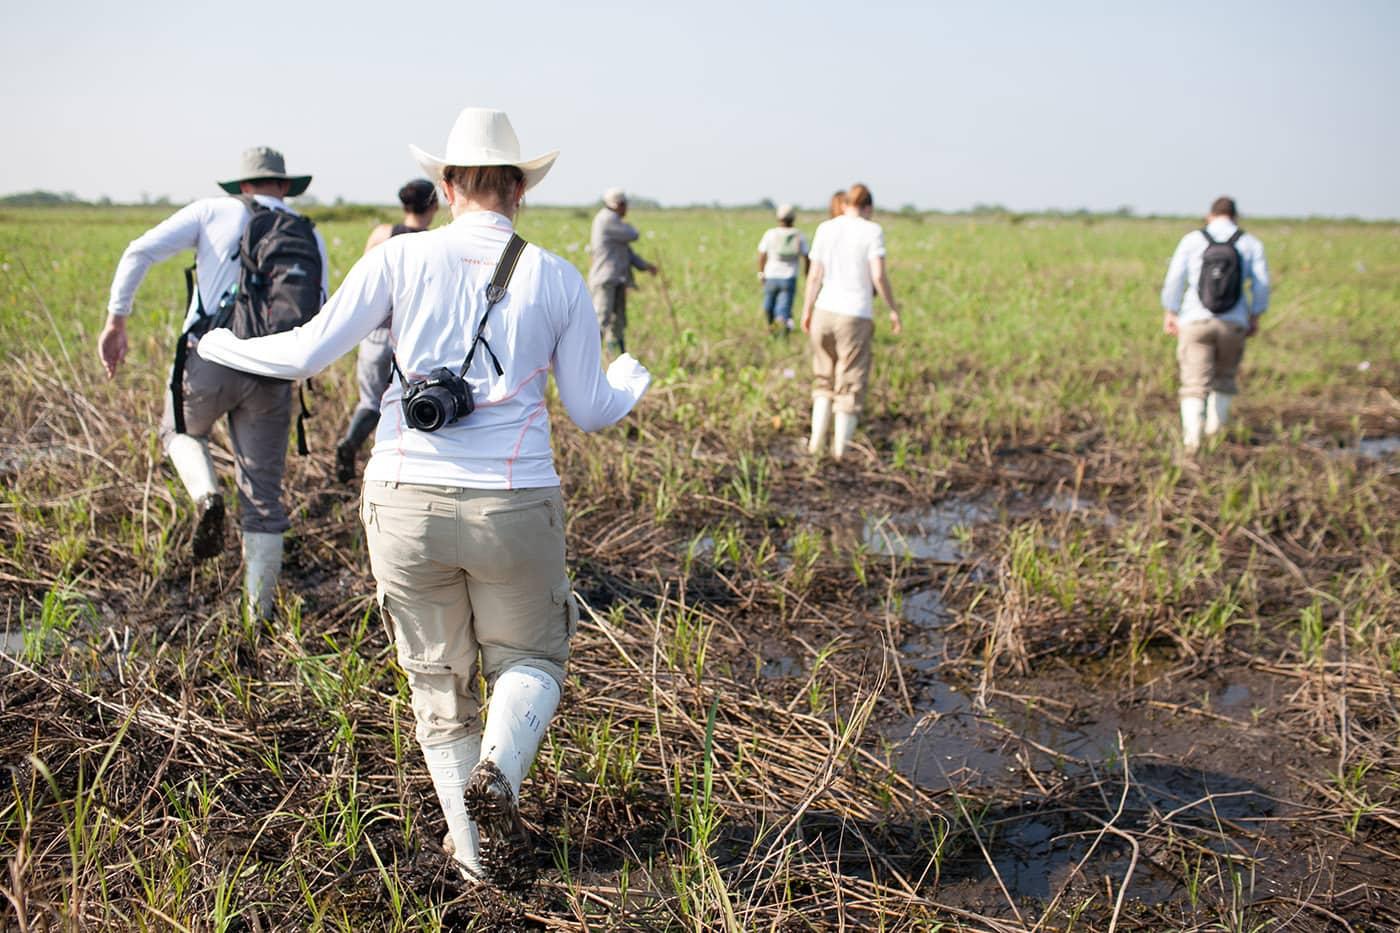 Anaconda hunting - The Pampas in the Bolivian Amazon